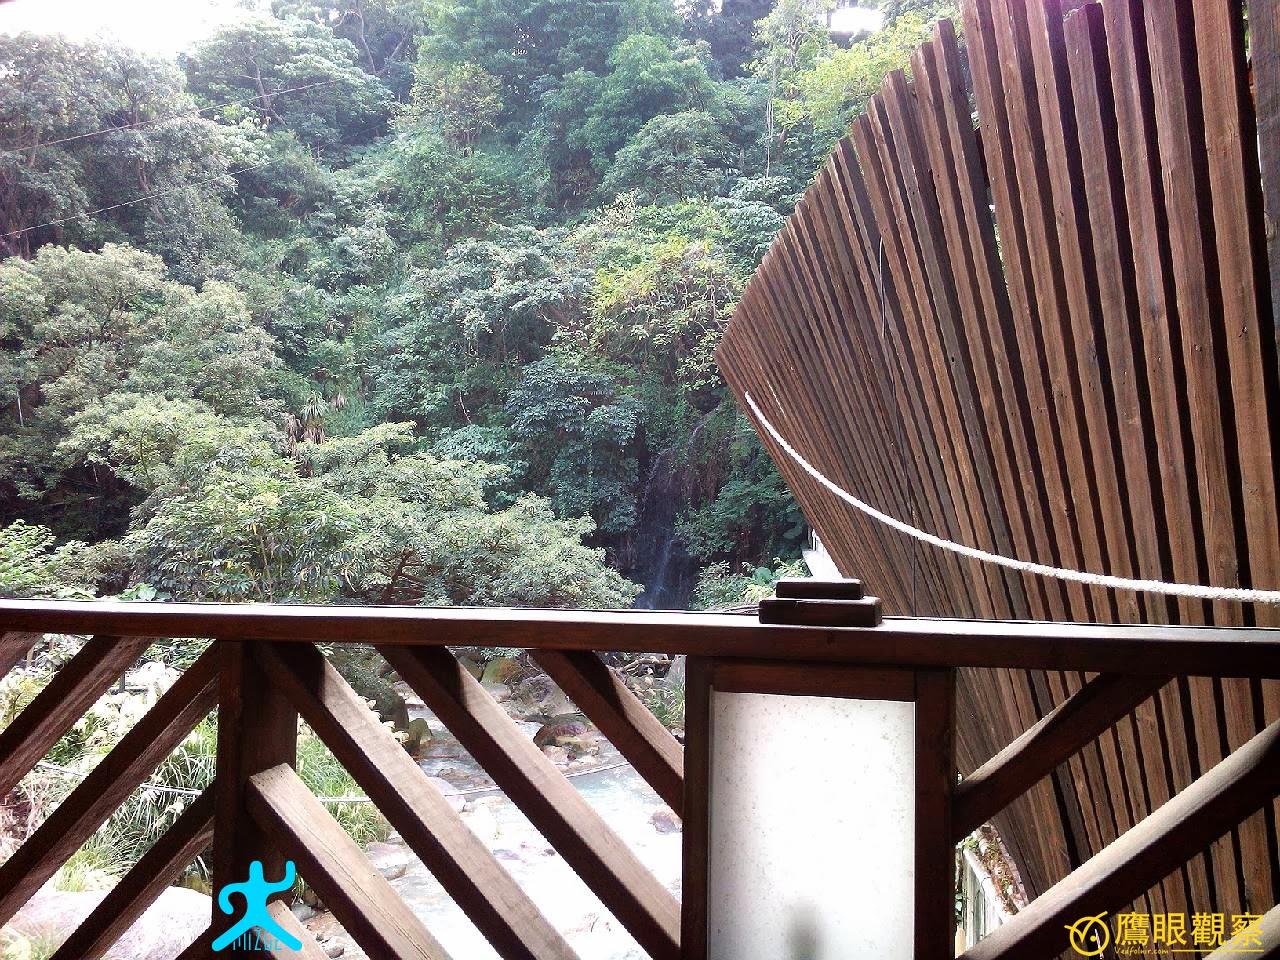 hot spring taipei beitou yangmingshan bathhouse tienhsiang 02 北投「天祥溫泉餐廳」台北泡湯的好地方